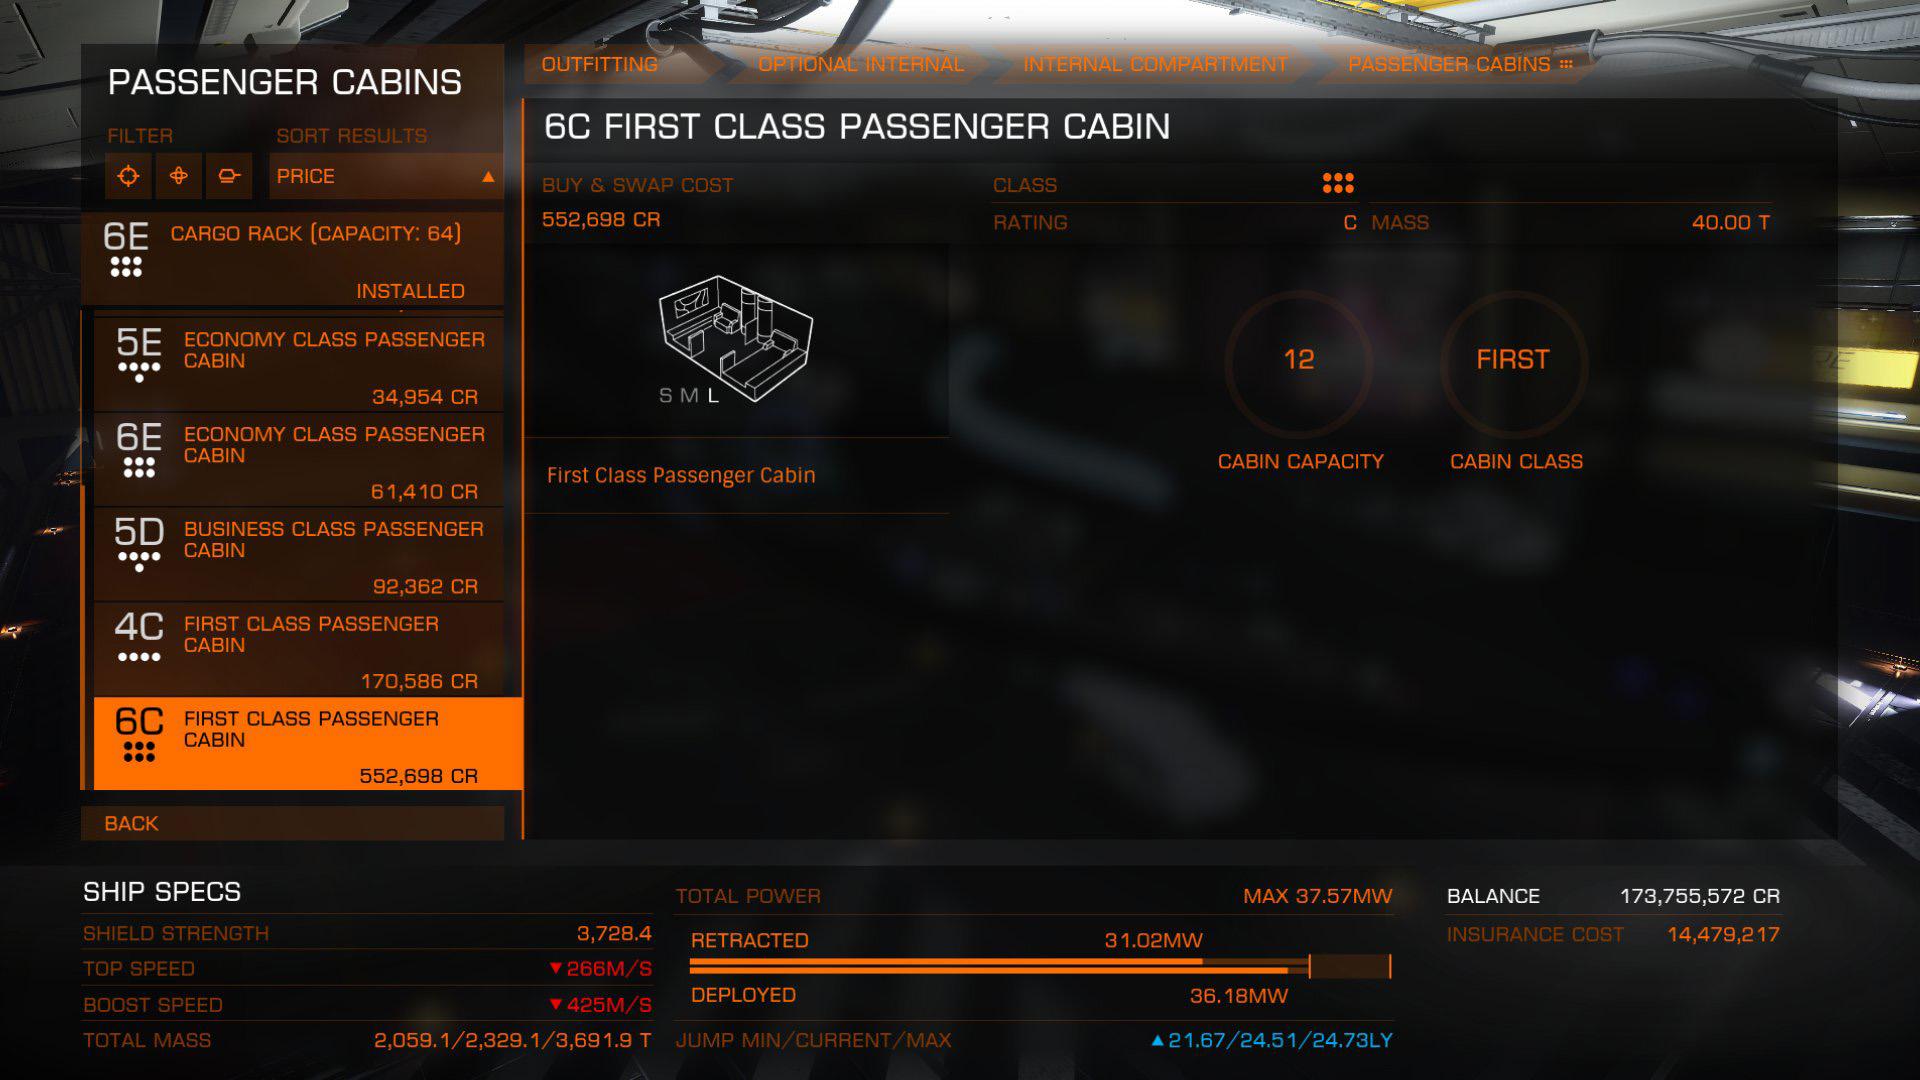 Elite: Dangerous beginner's guide: a screenshot showing various types of passenger cabin modules